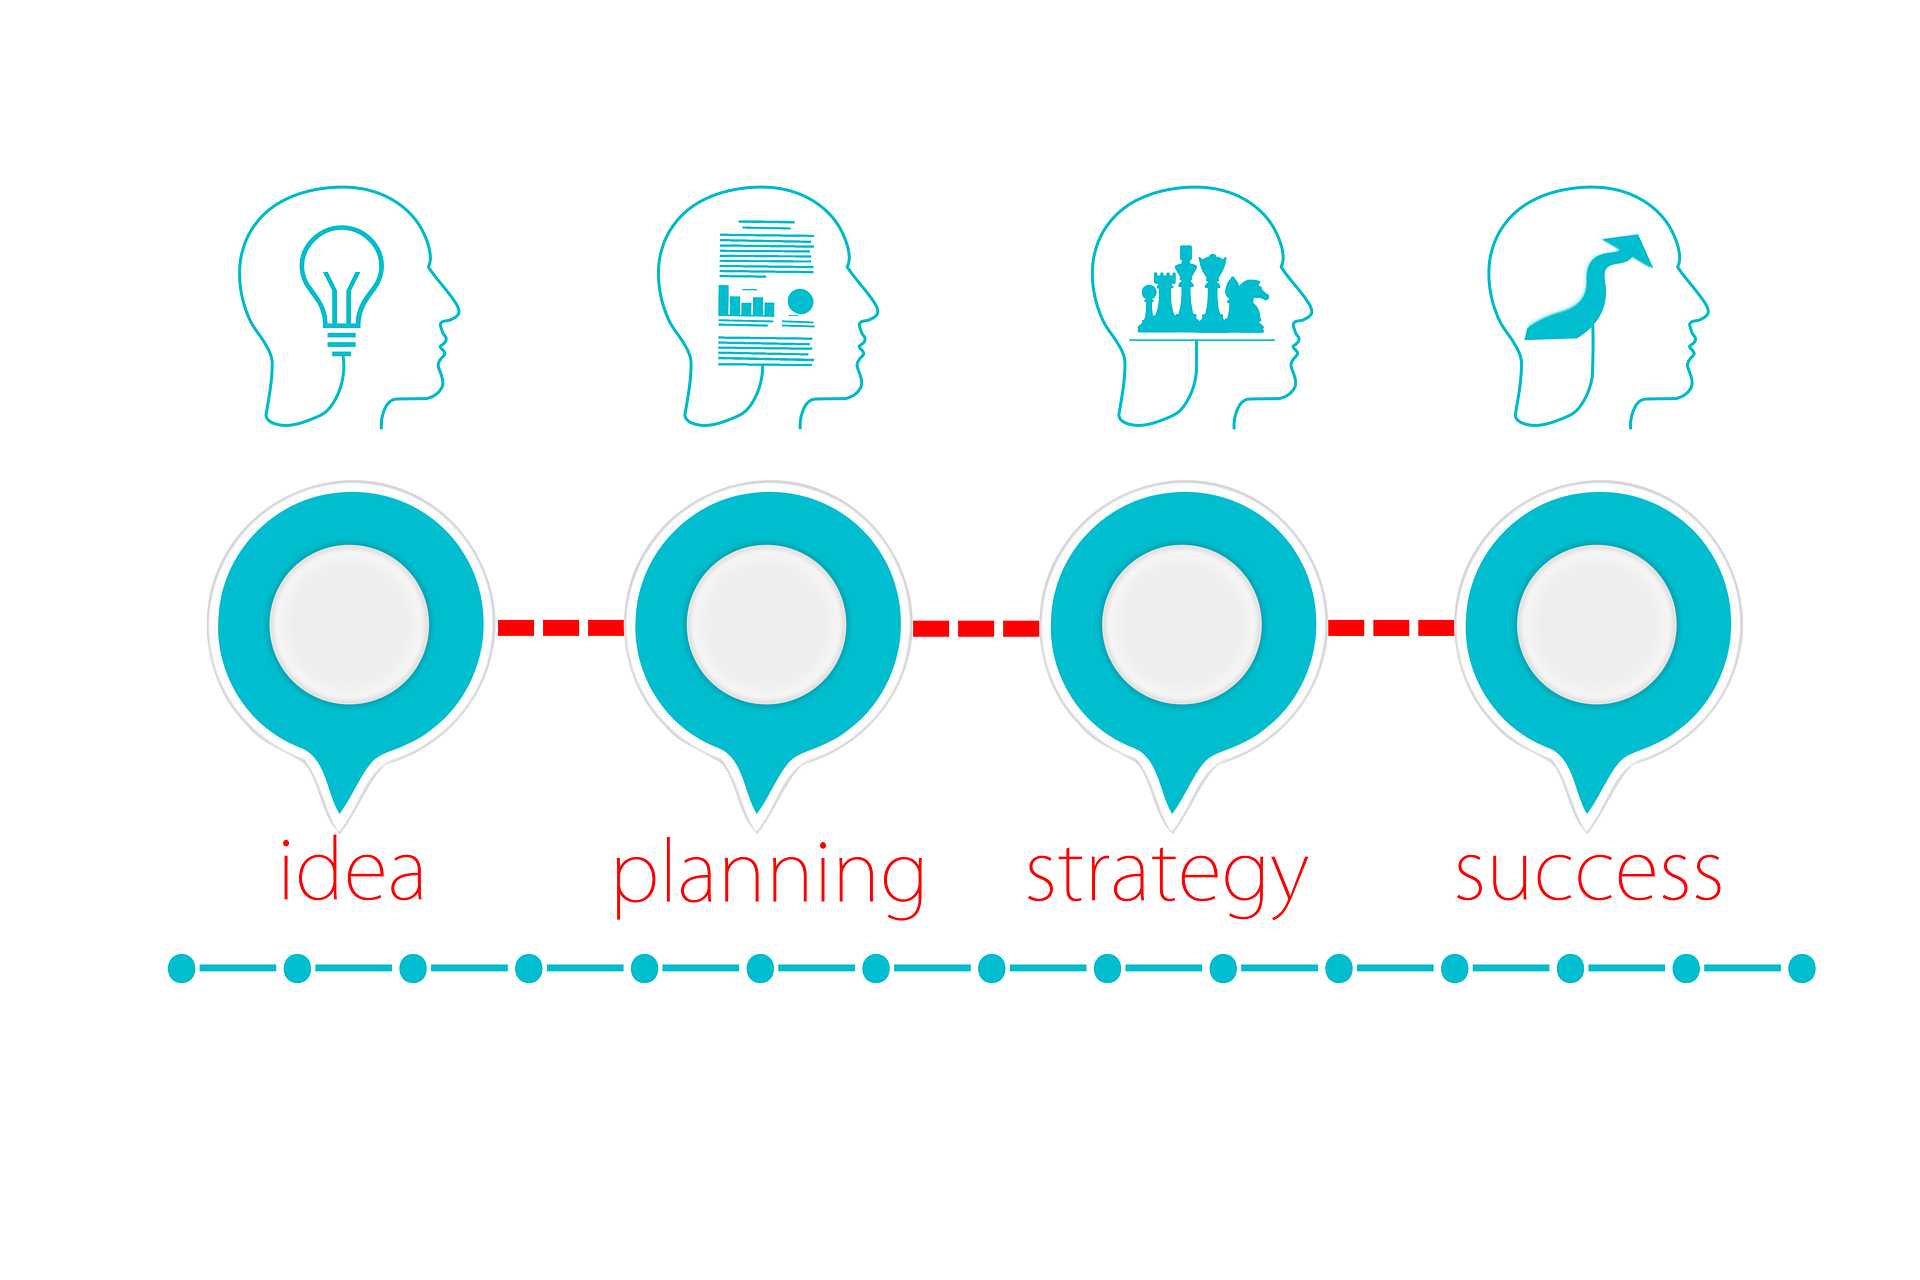 planning for success diagram